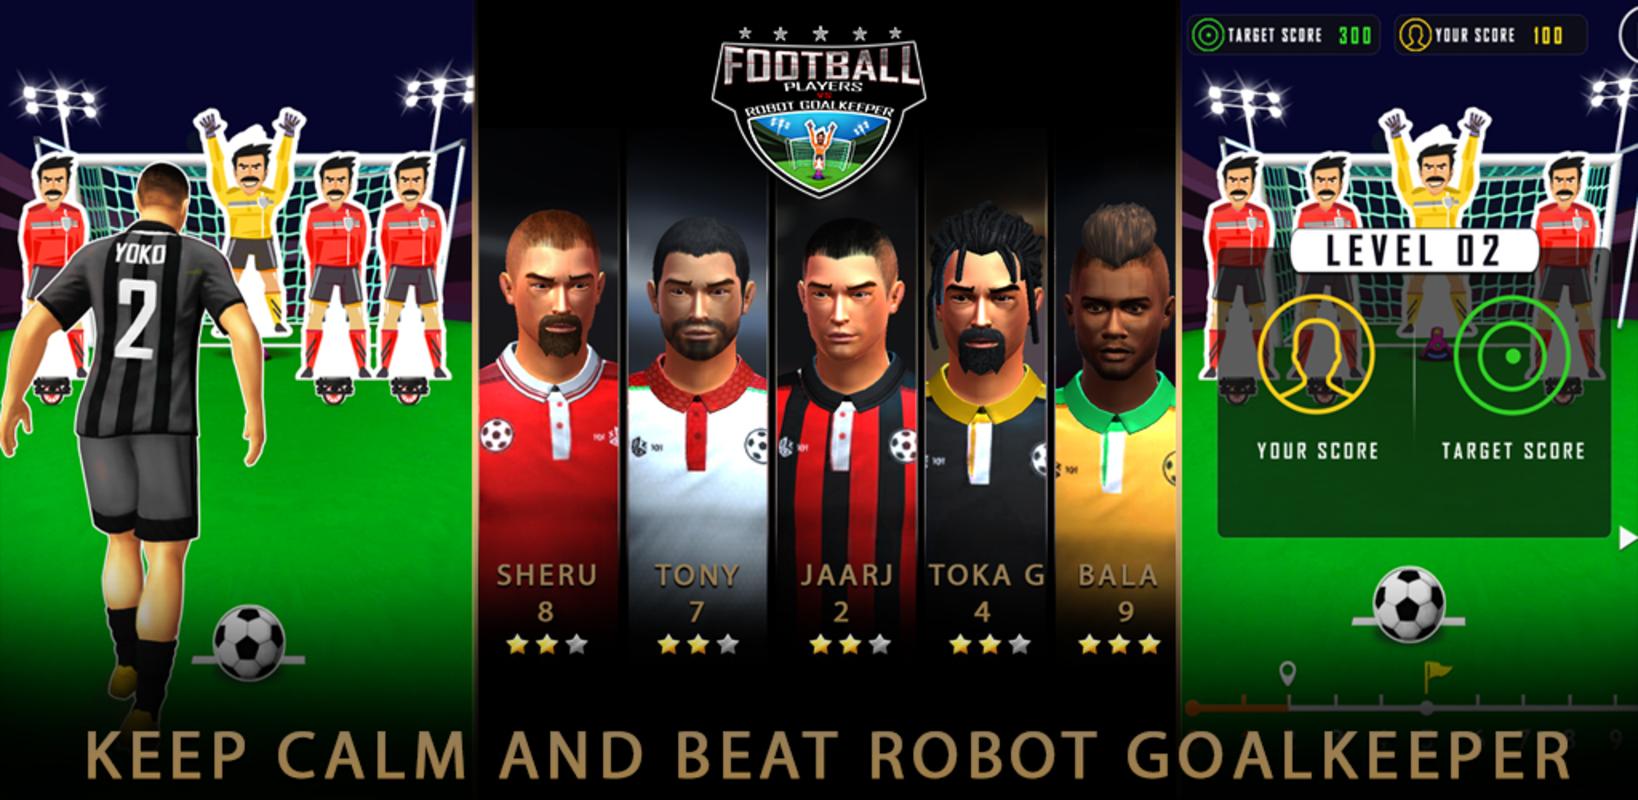 Play FootballStrike/RoboKeeper